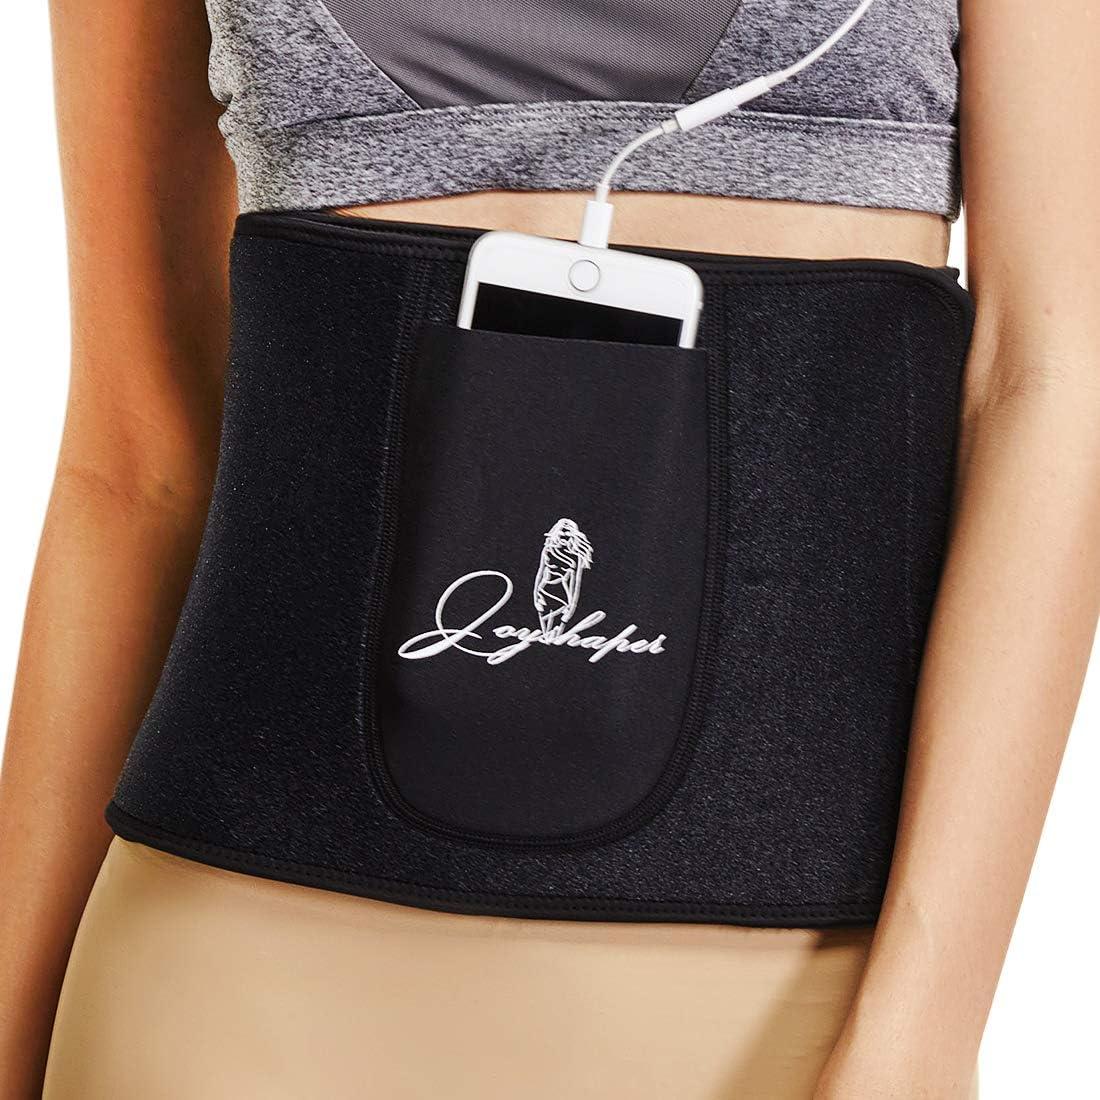 Amazon Com Waist Trimmer Belt Weight Loss Stomach Shaper Women Sweat Belly Band Wraps Ab Sauna Exercise Belt Sports Outdoors